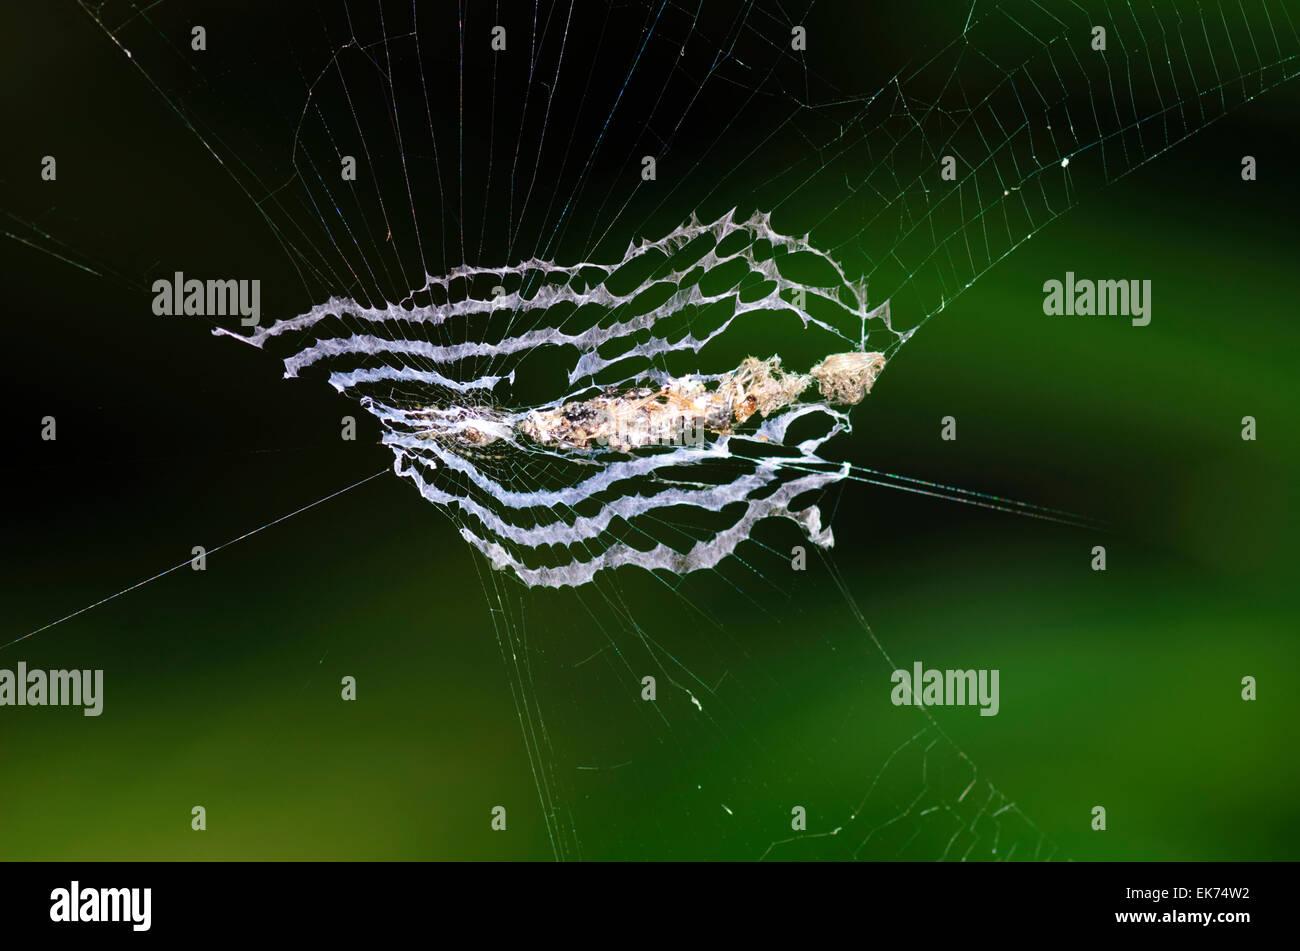 Spiderweb of Orb-weaving Spider (Cyclosa insulana), Queensland, Australia - Stock Image